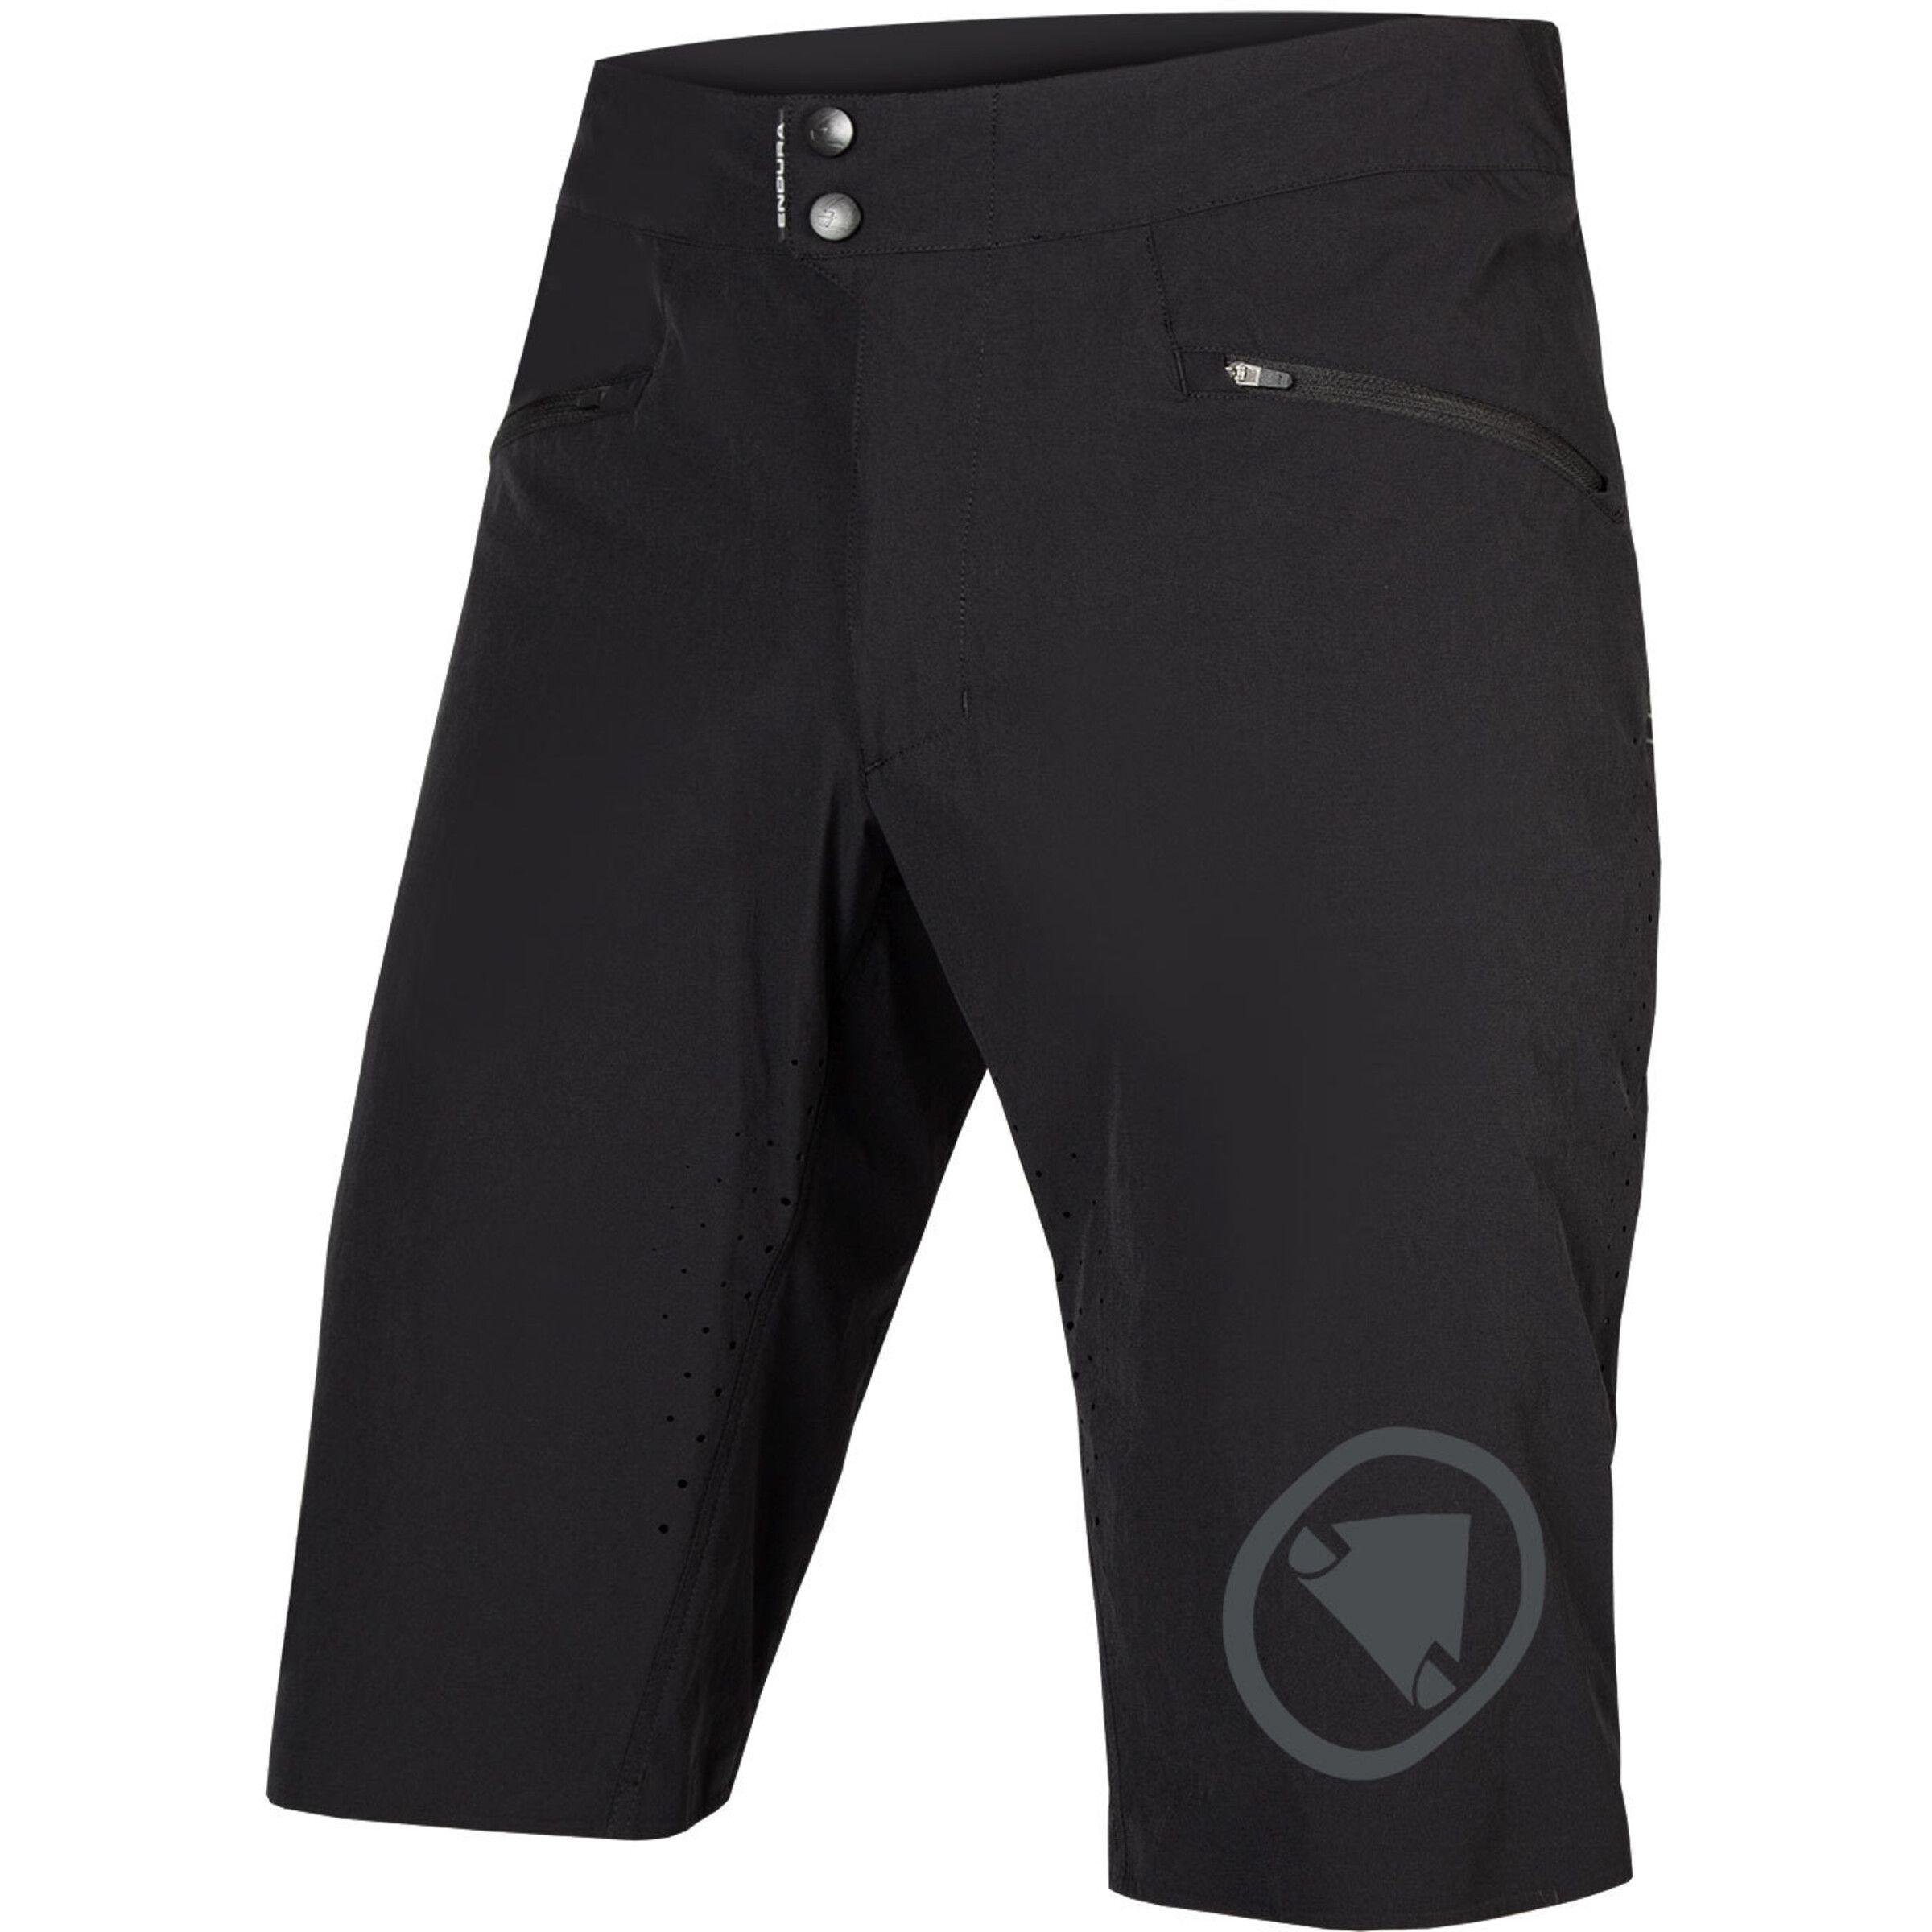 endura-singetrack-lite-shorts-men-black-1.jpg